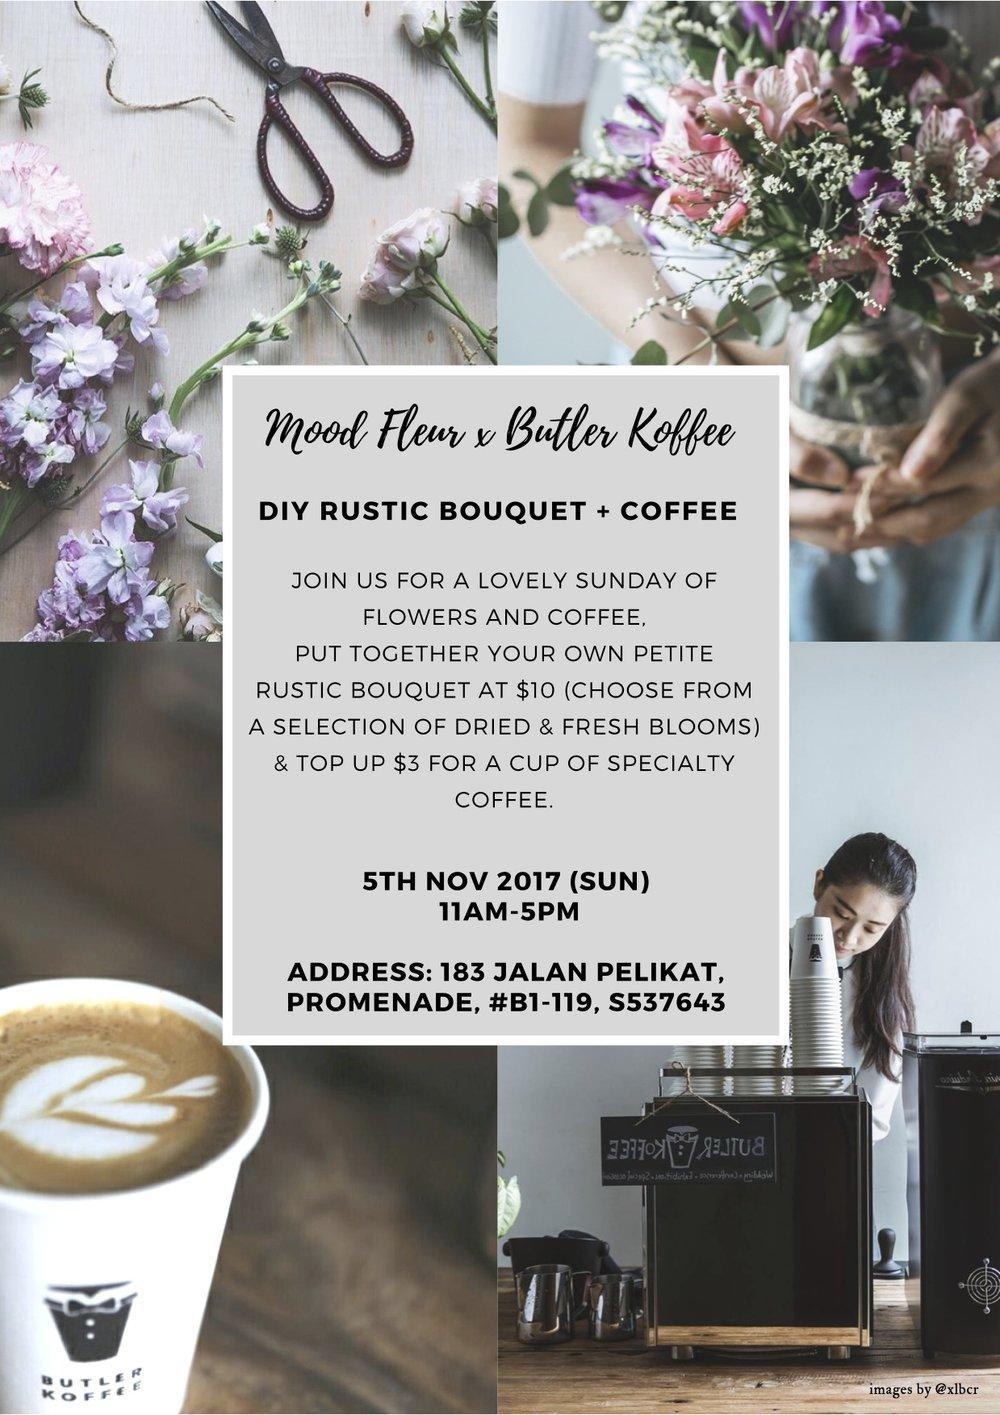 mood fleur x butler koffee flyer copy.jpg